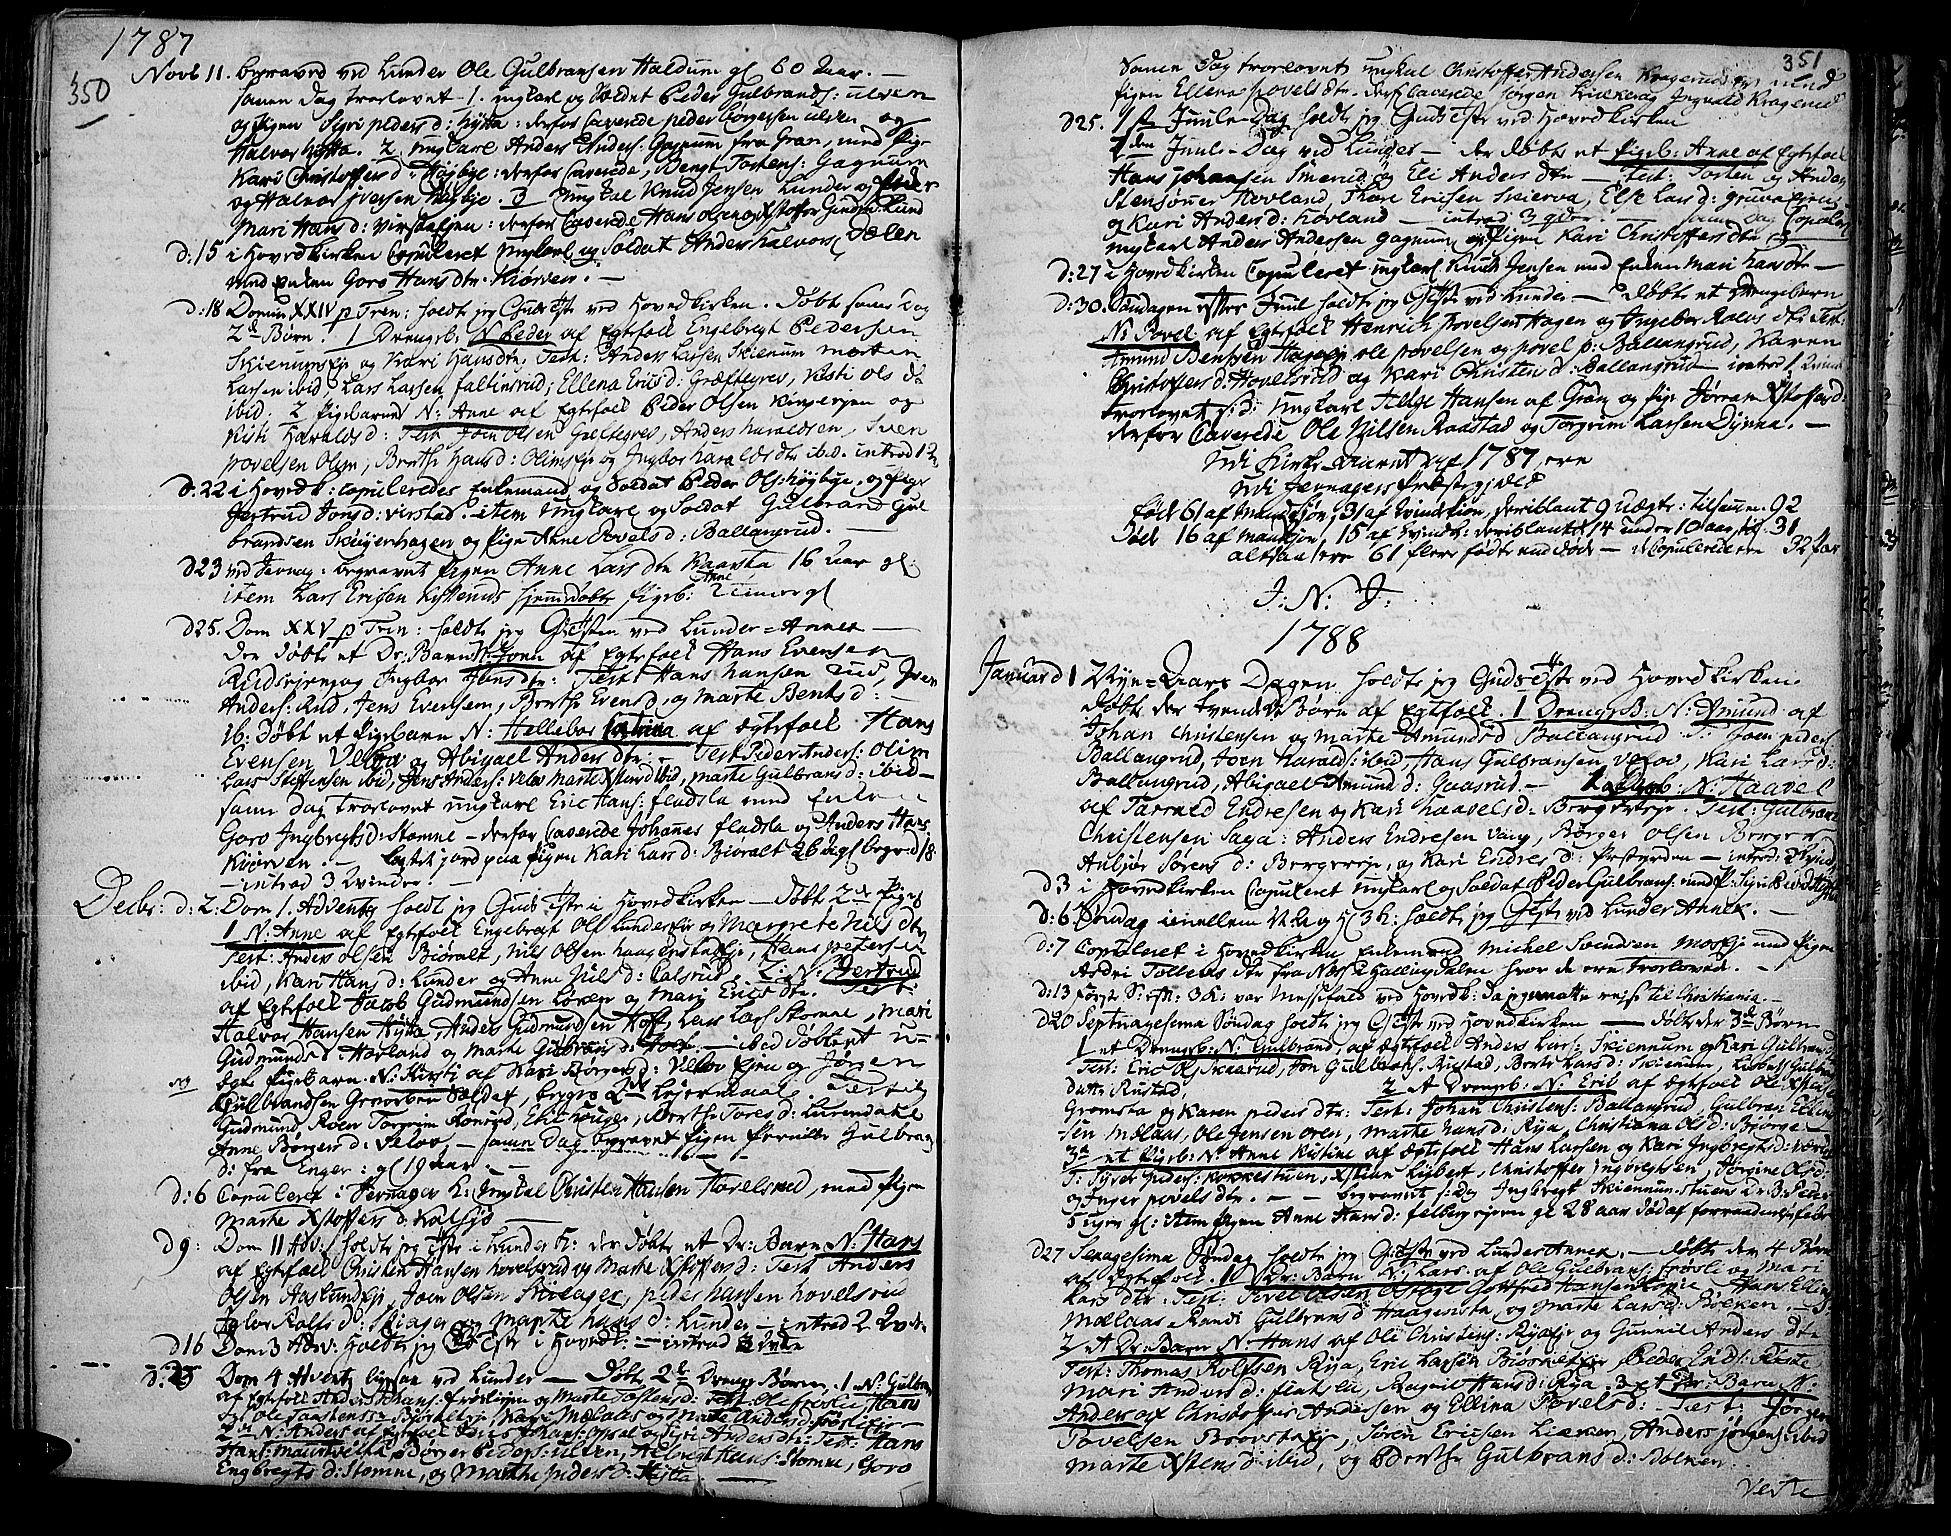 SAH, Jevnaker prestekontor, Ministerialbok nr. 3, 1752-1799, s. 350-351